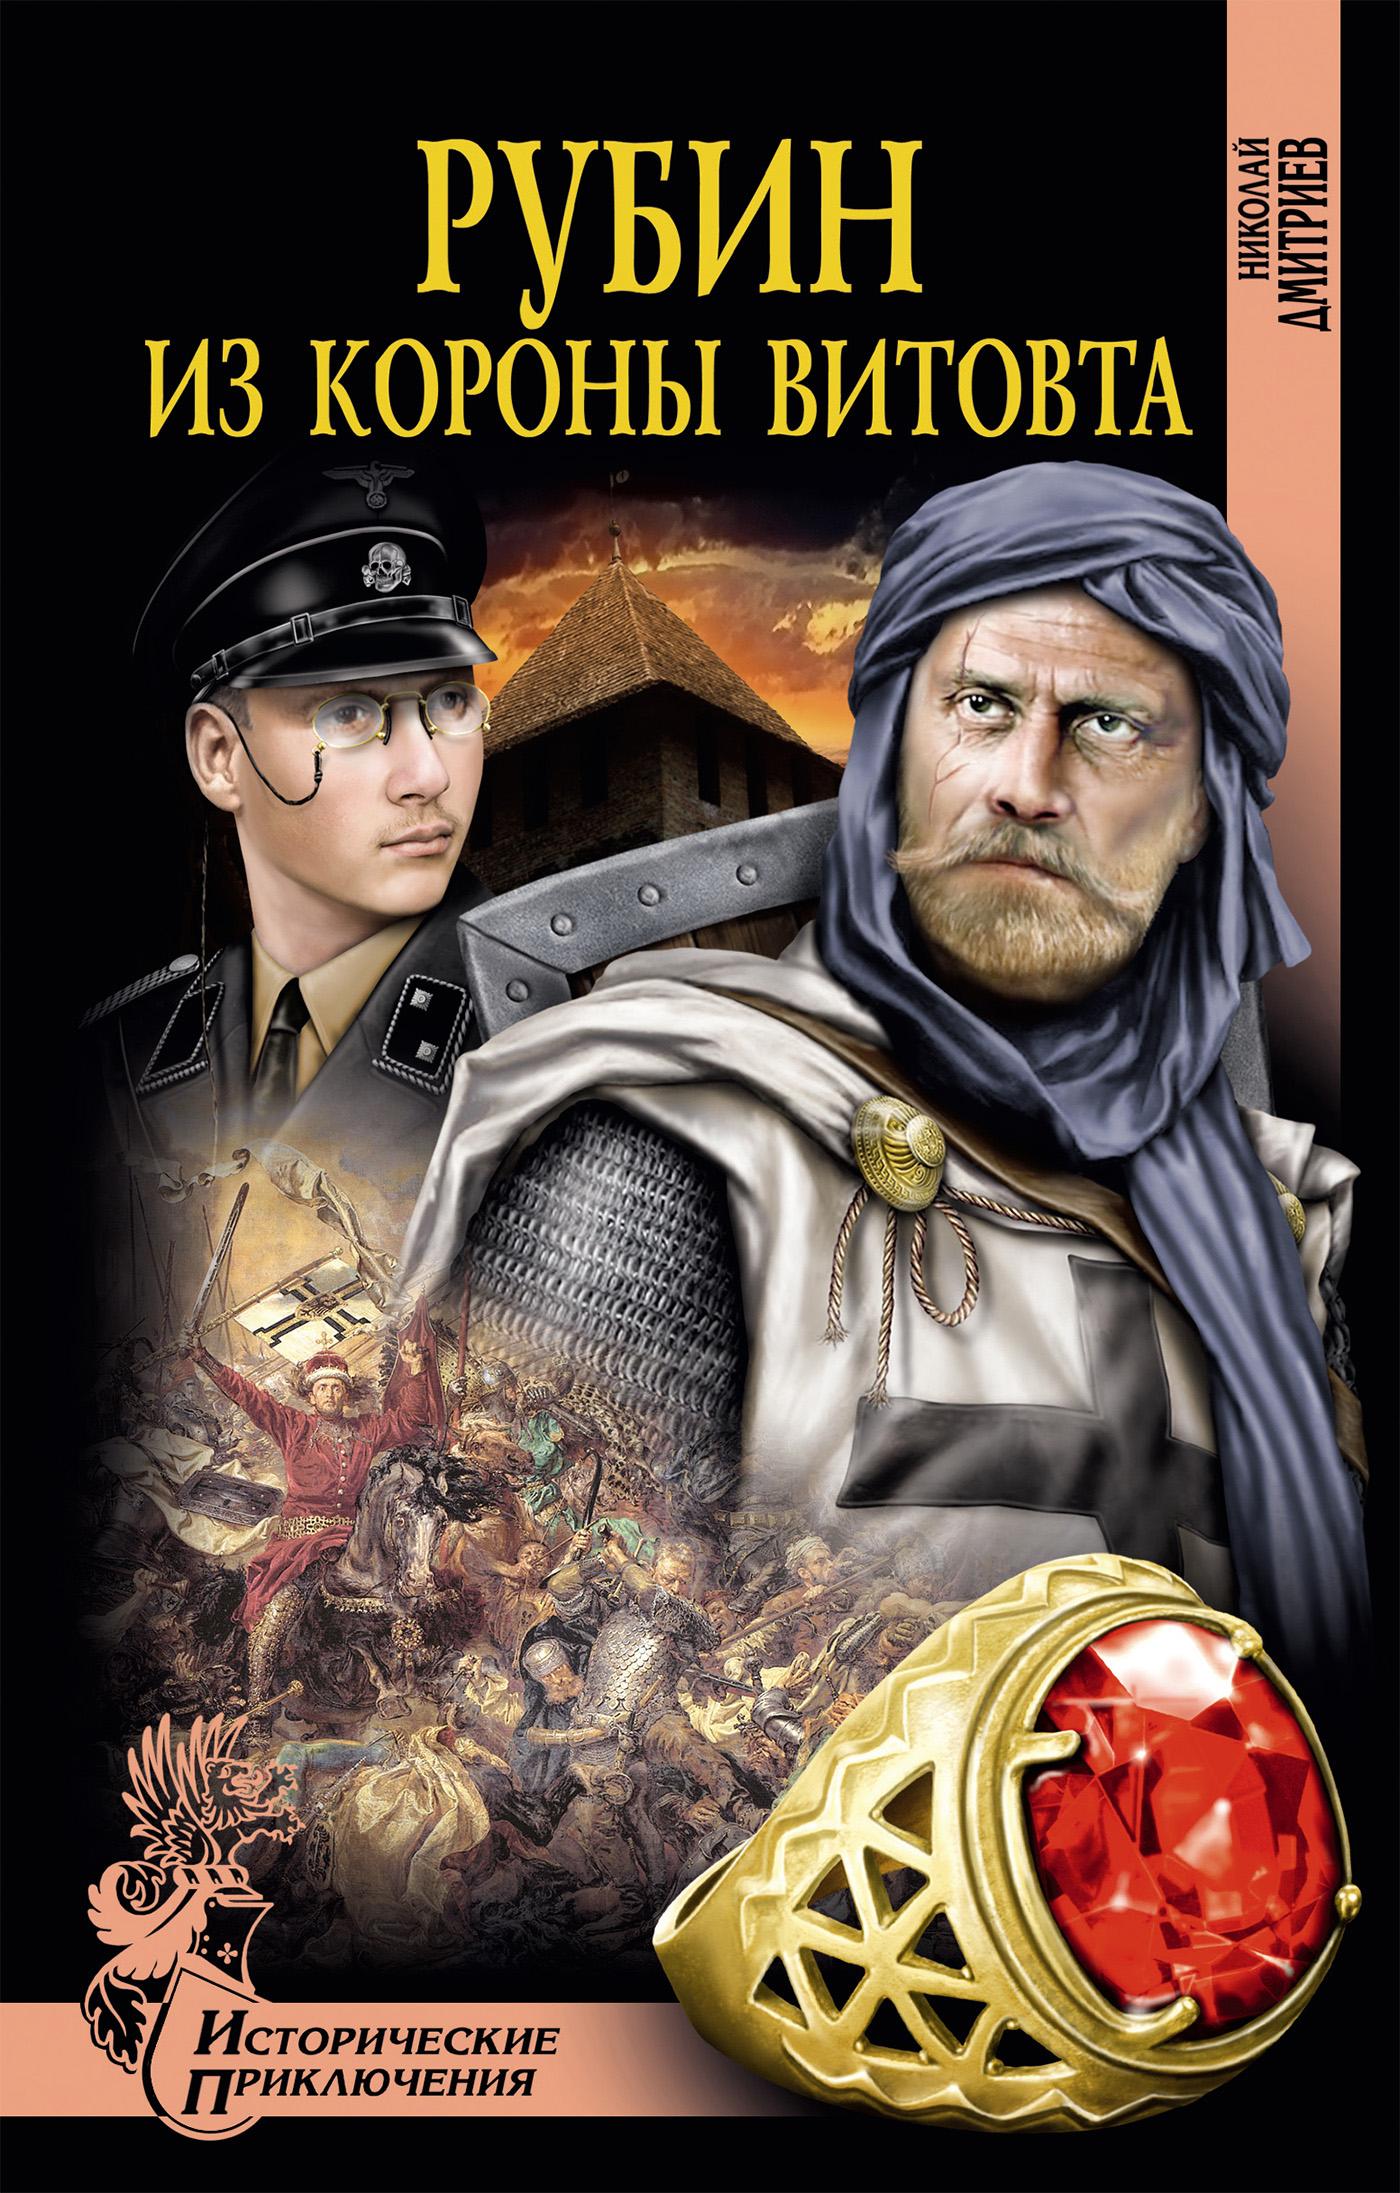 Николай Дмитриев Рубин изкороны Витовта